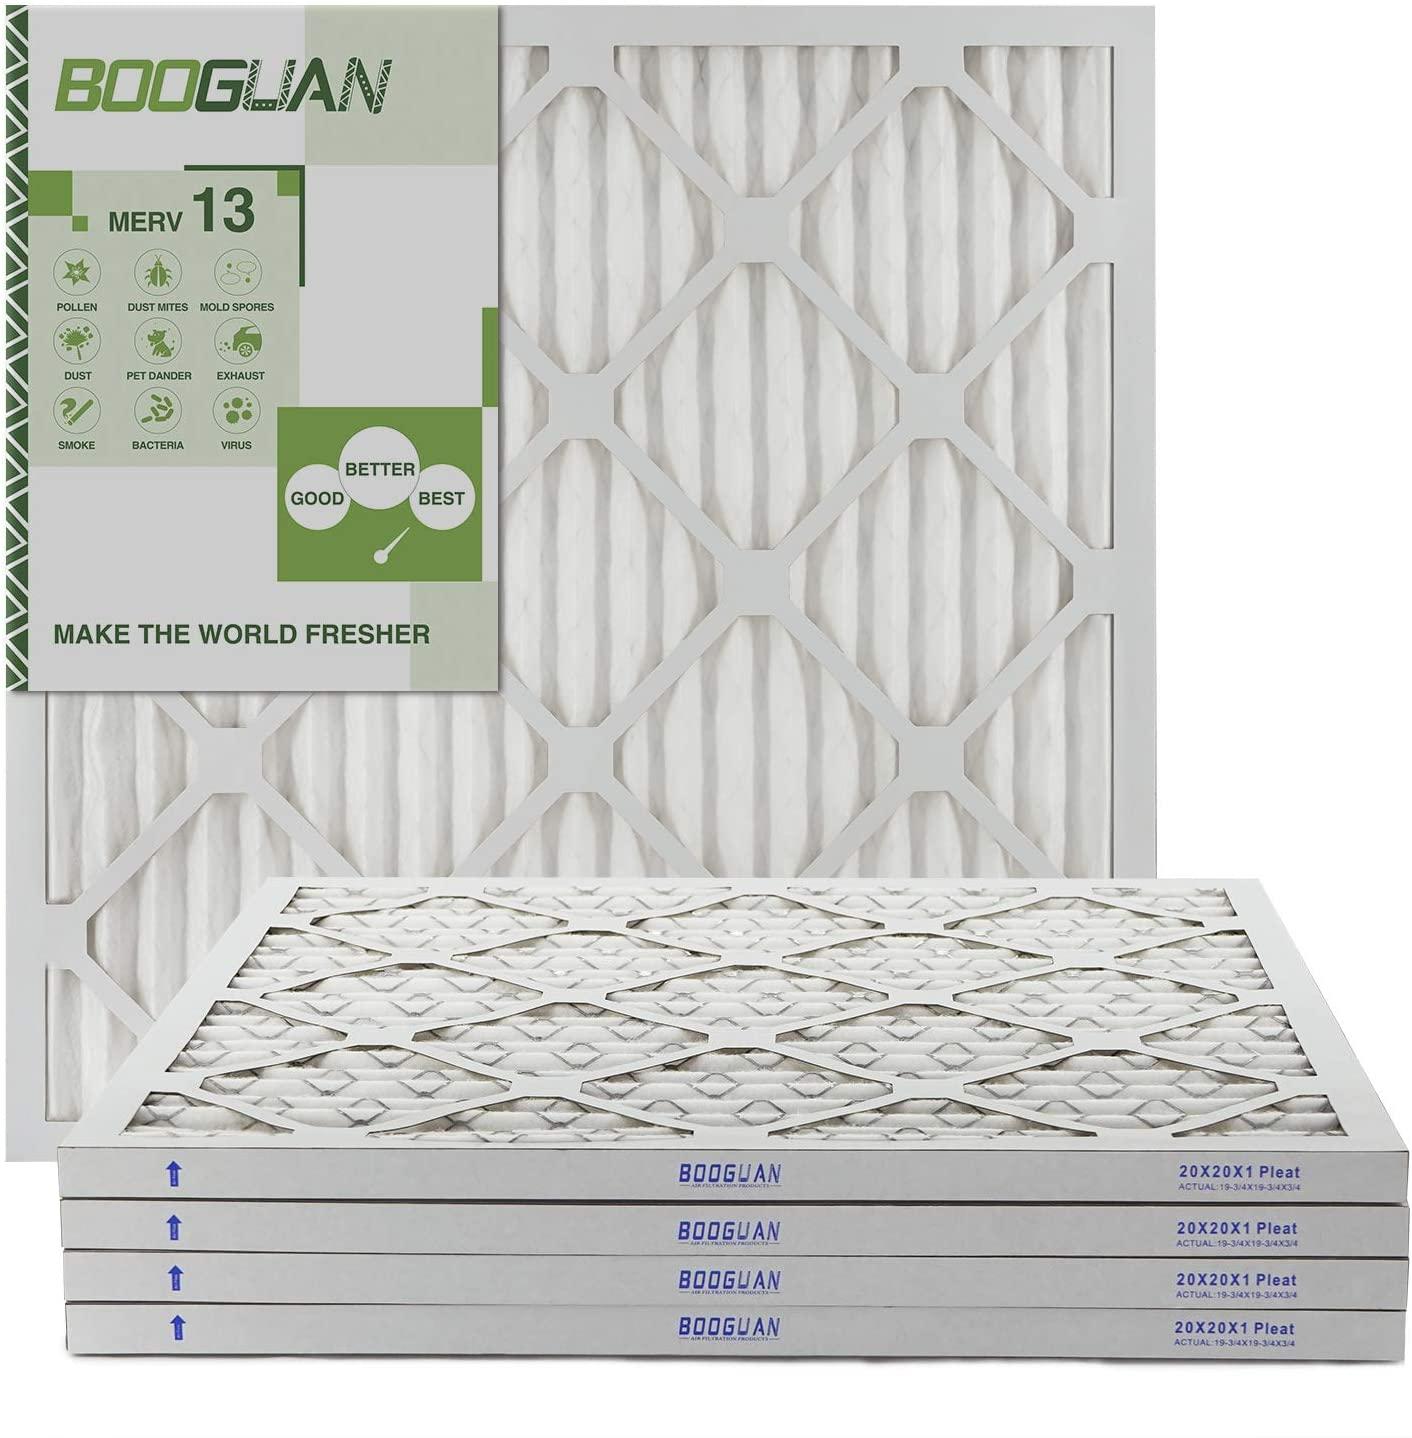 BOOGUAN 20x20x1 MERV13 Pleated AC Furnace Air Filter 4-Pack